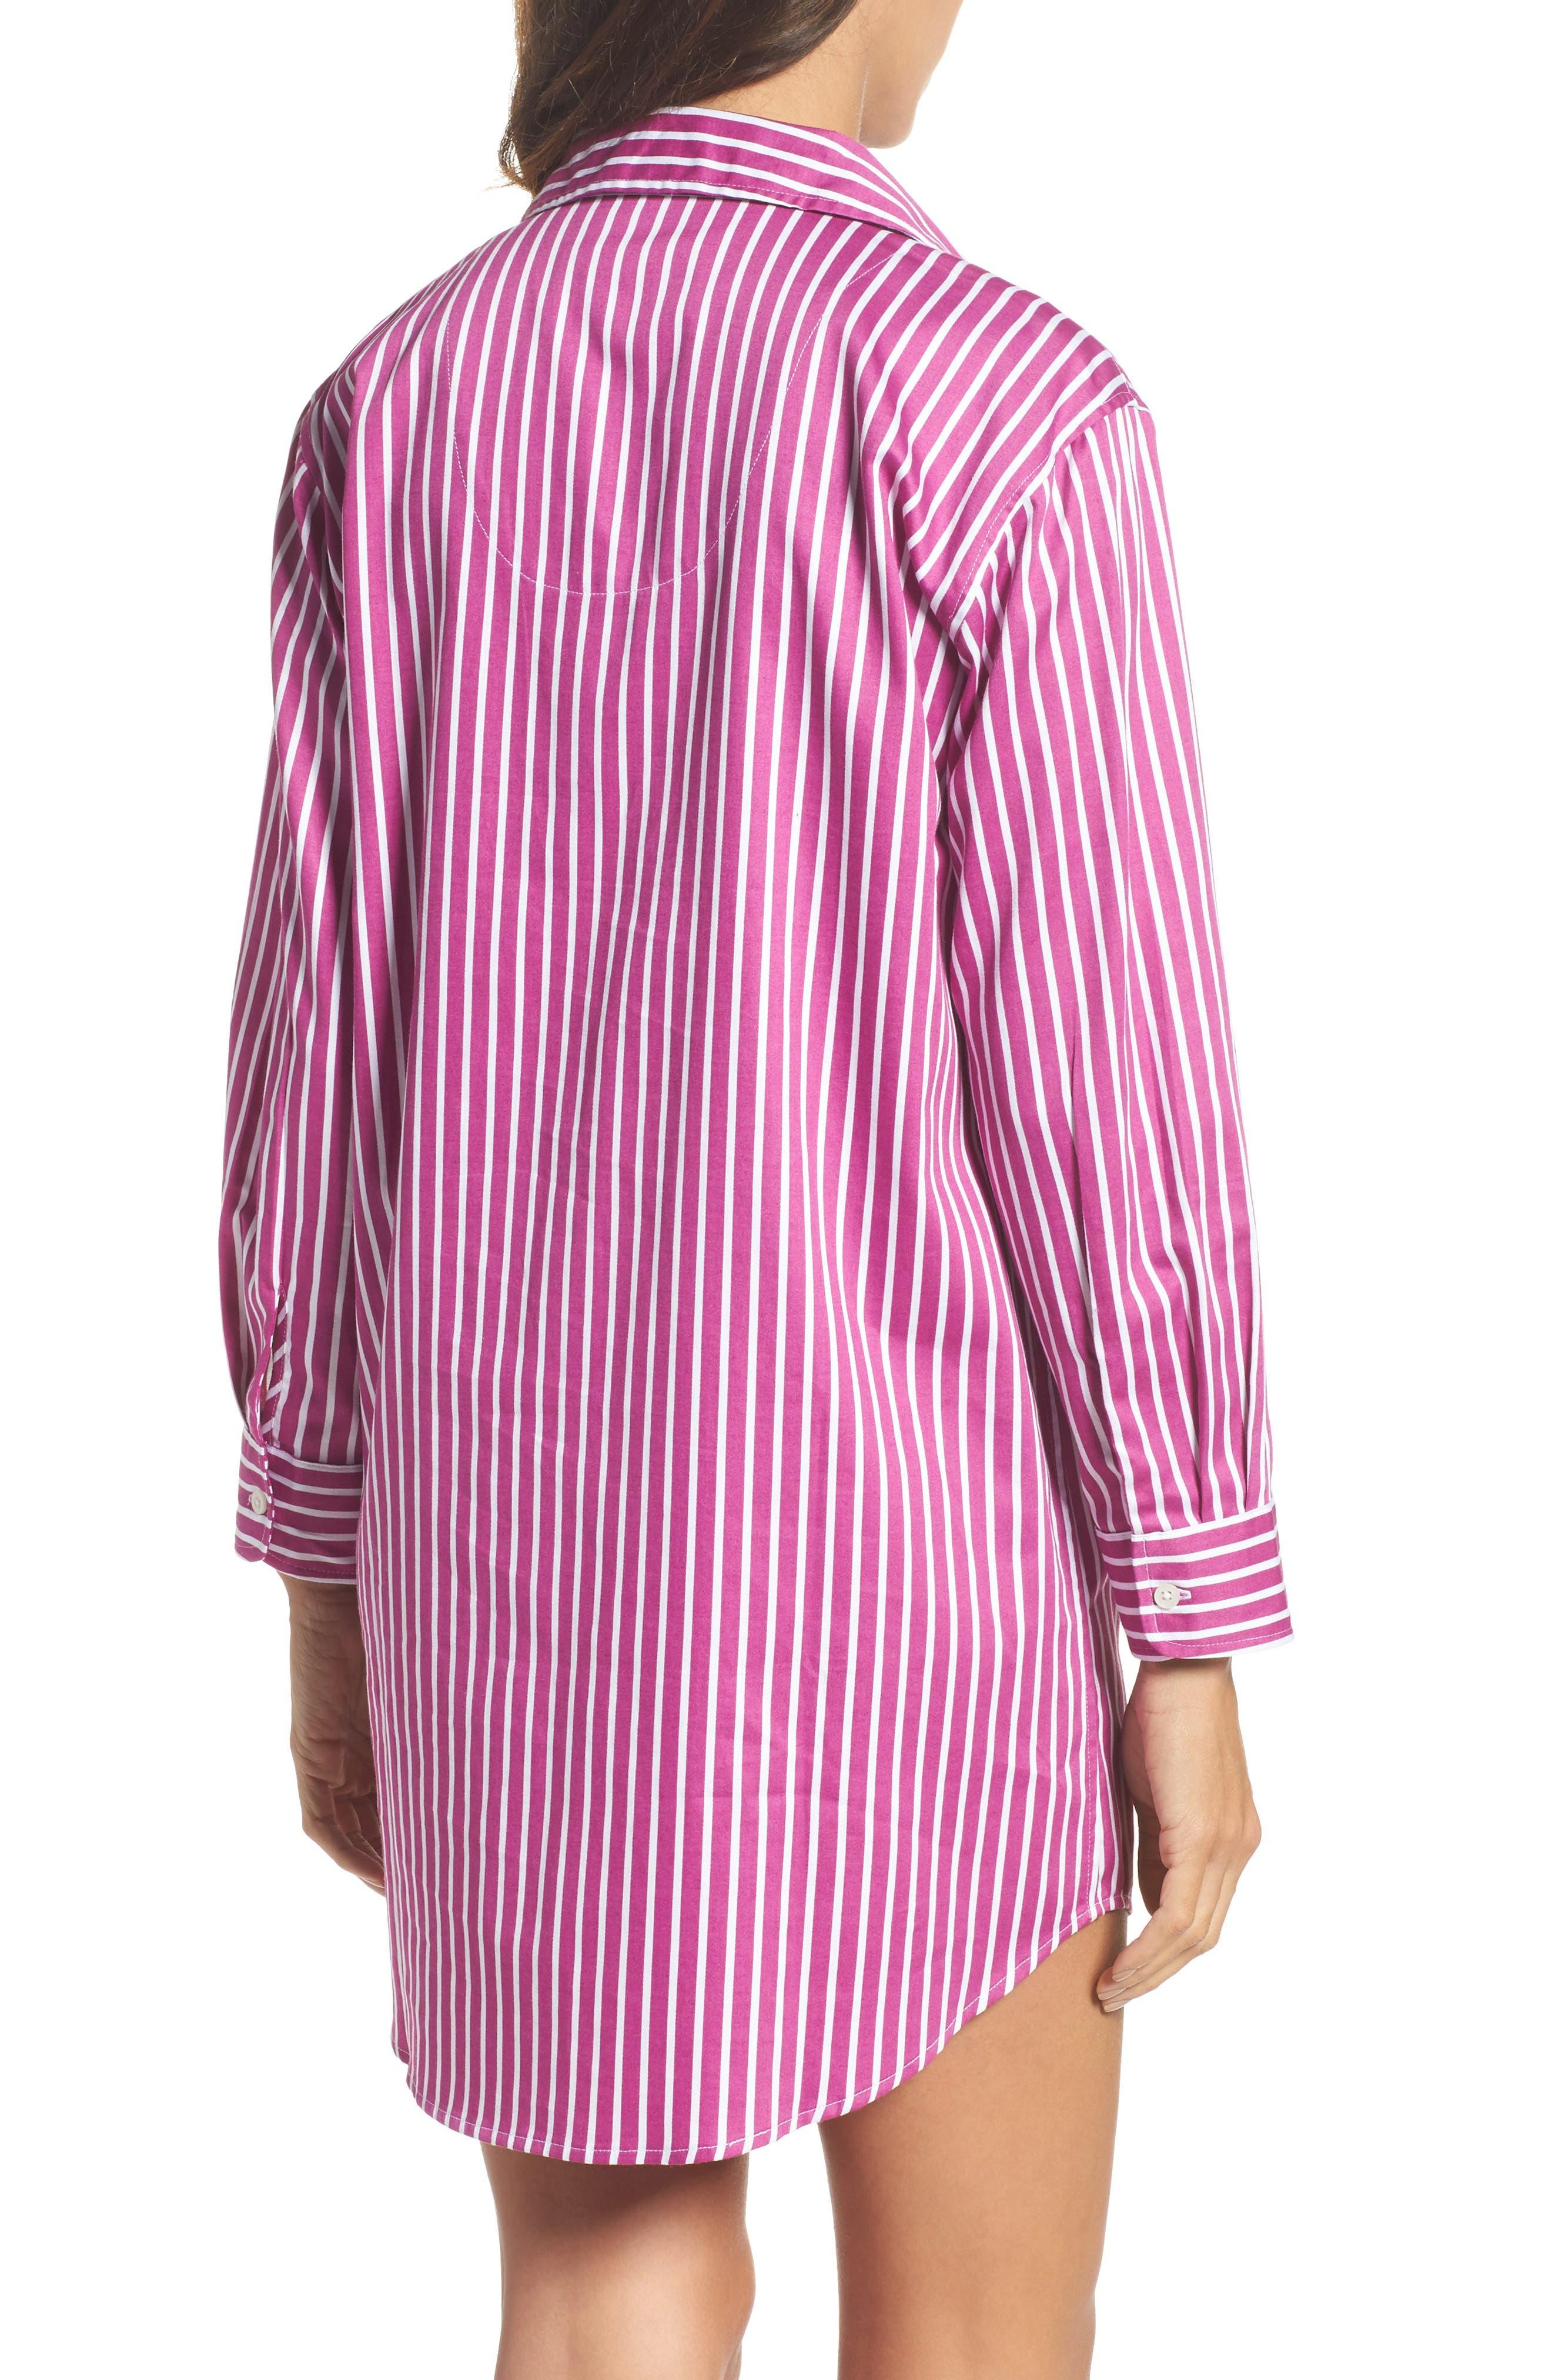 Sleep Shirt,                             Alternate thumbnail 2, color,                             Pink/ White Stripe